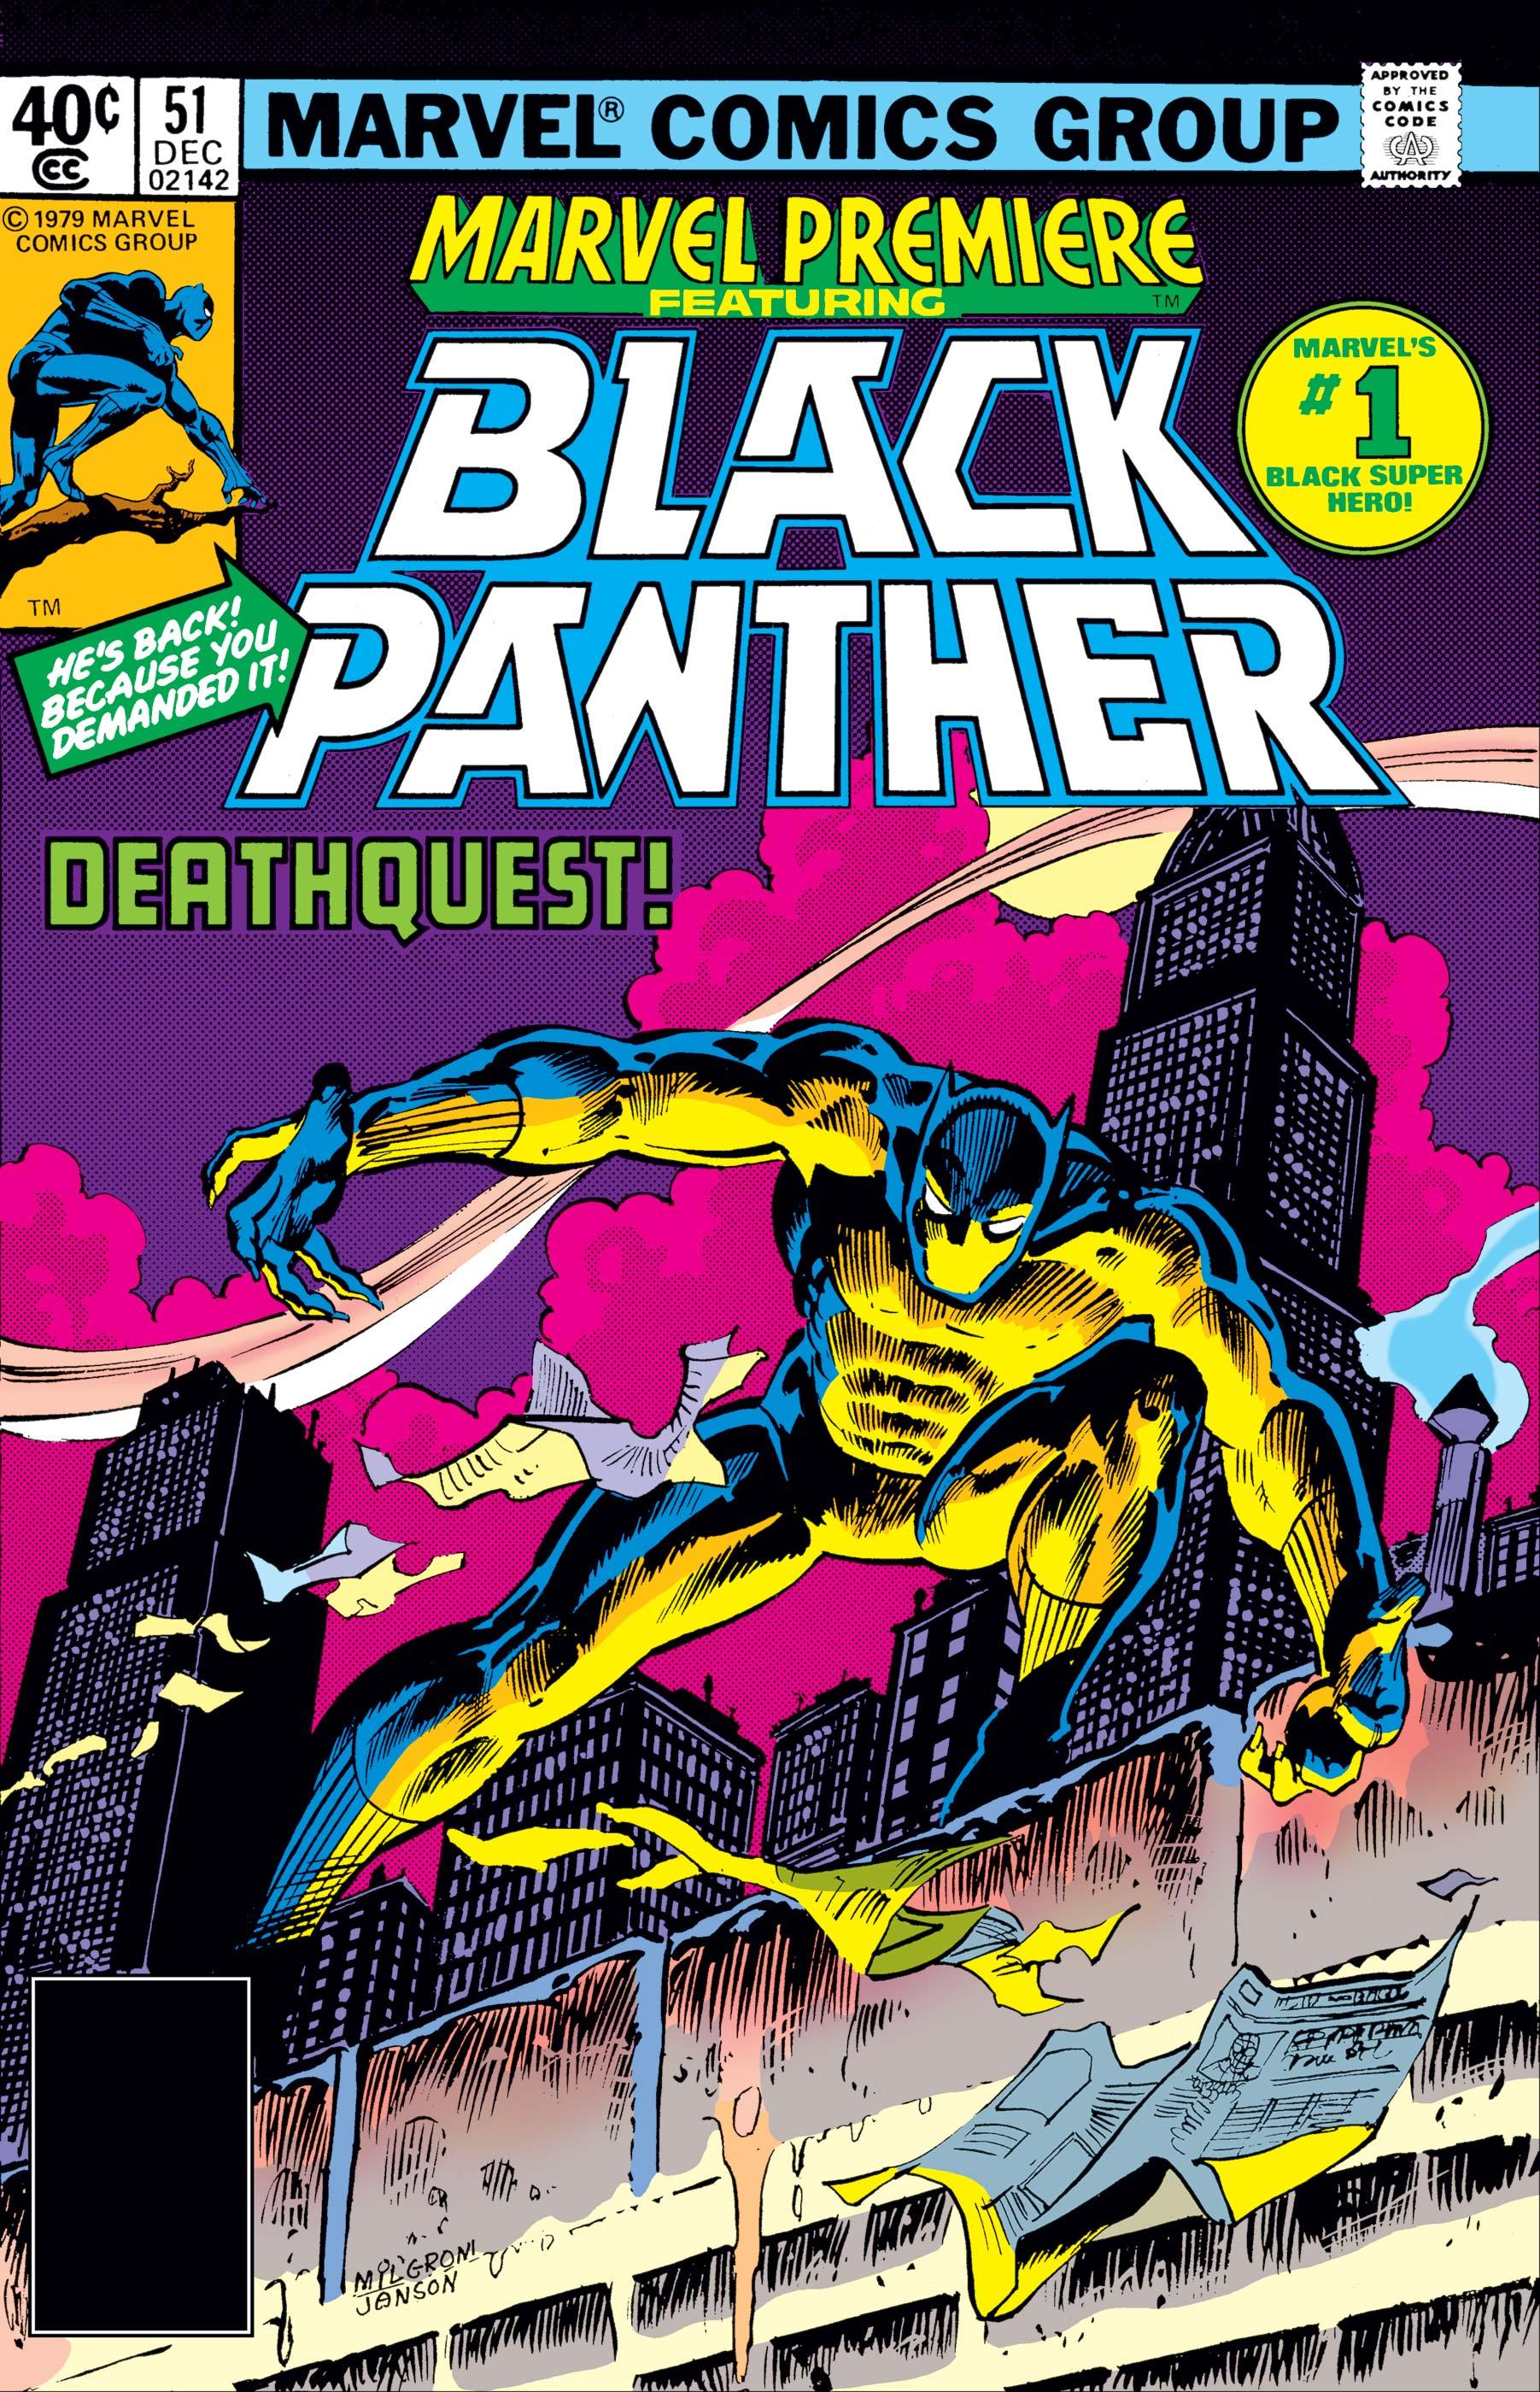 Marvel Premiere (1972) #51